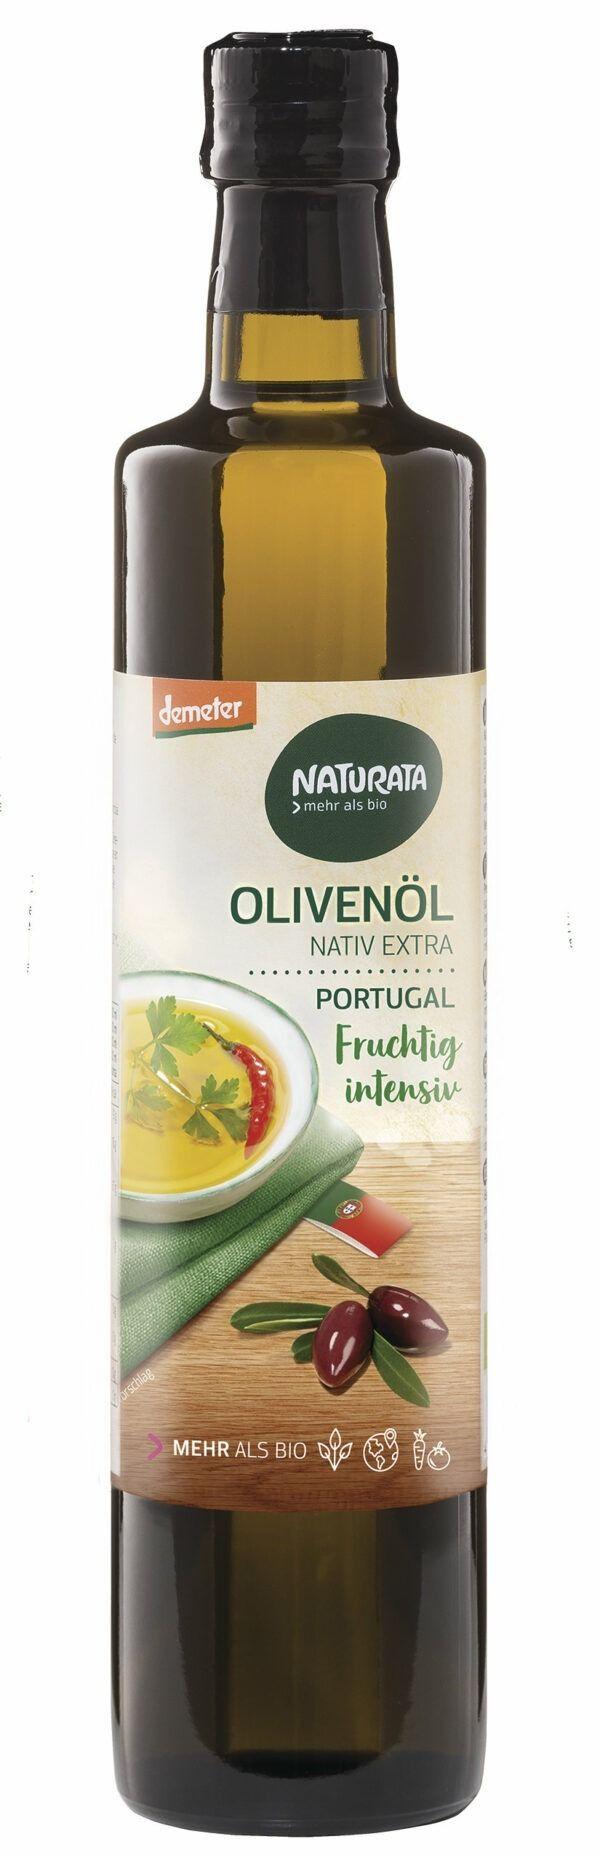 NATURATA Olivenöl Portugal ´Risca Grande´ nativ extra 6x500ml